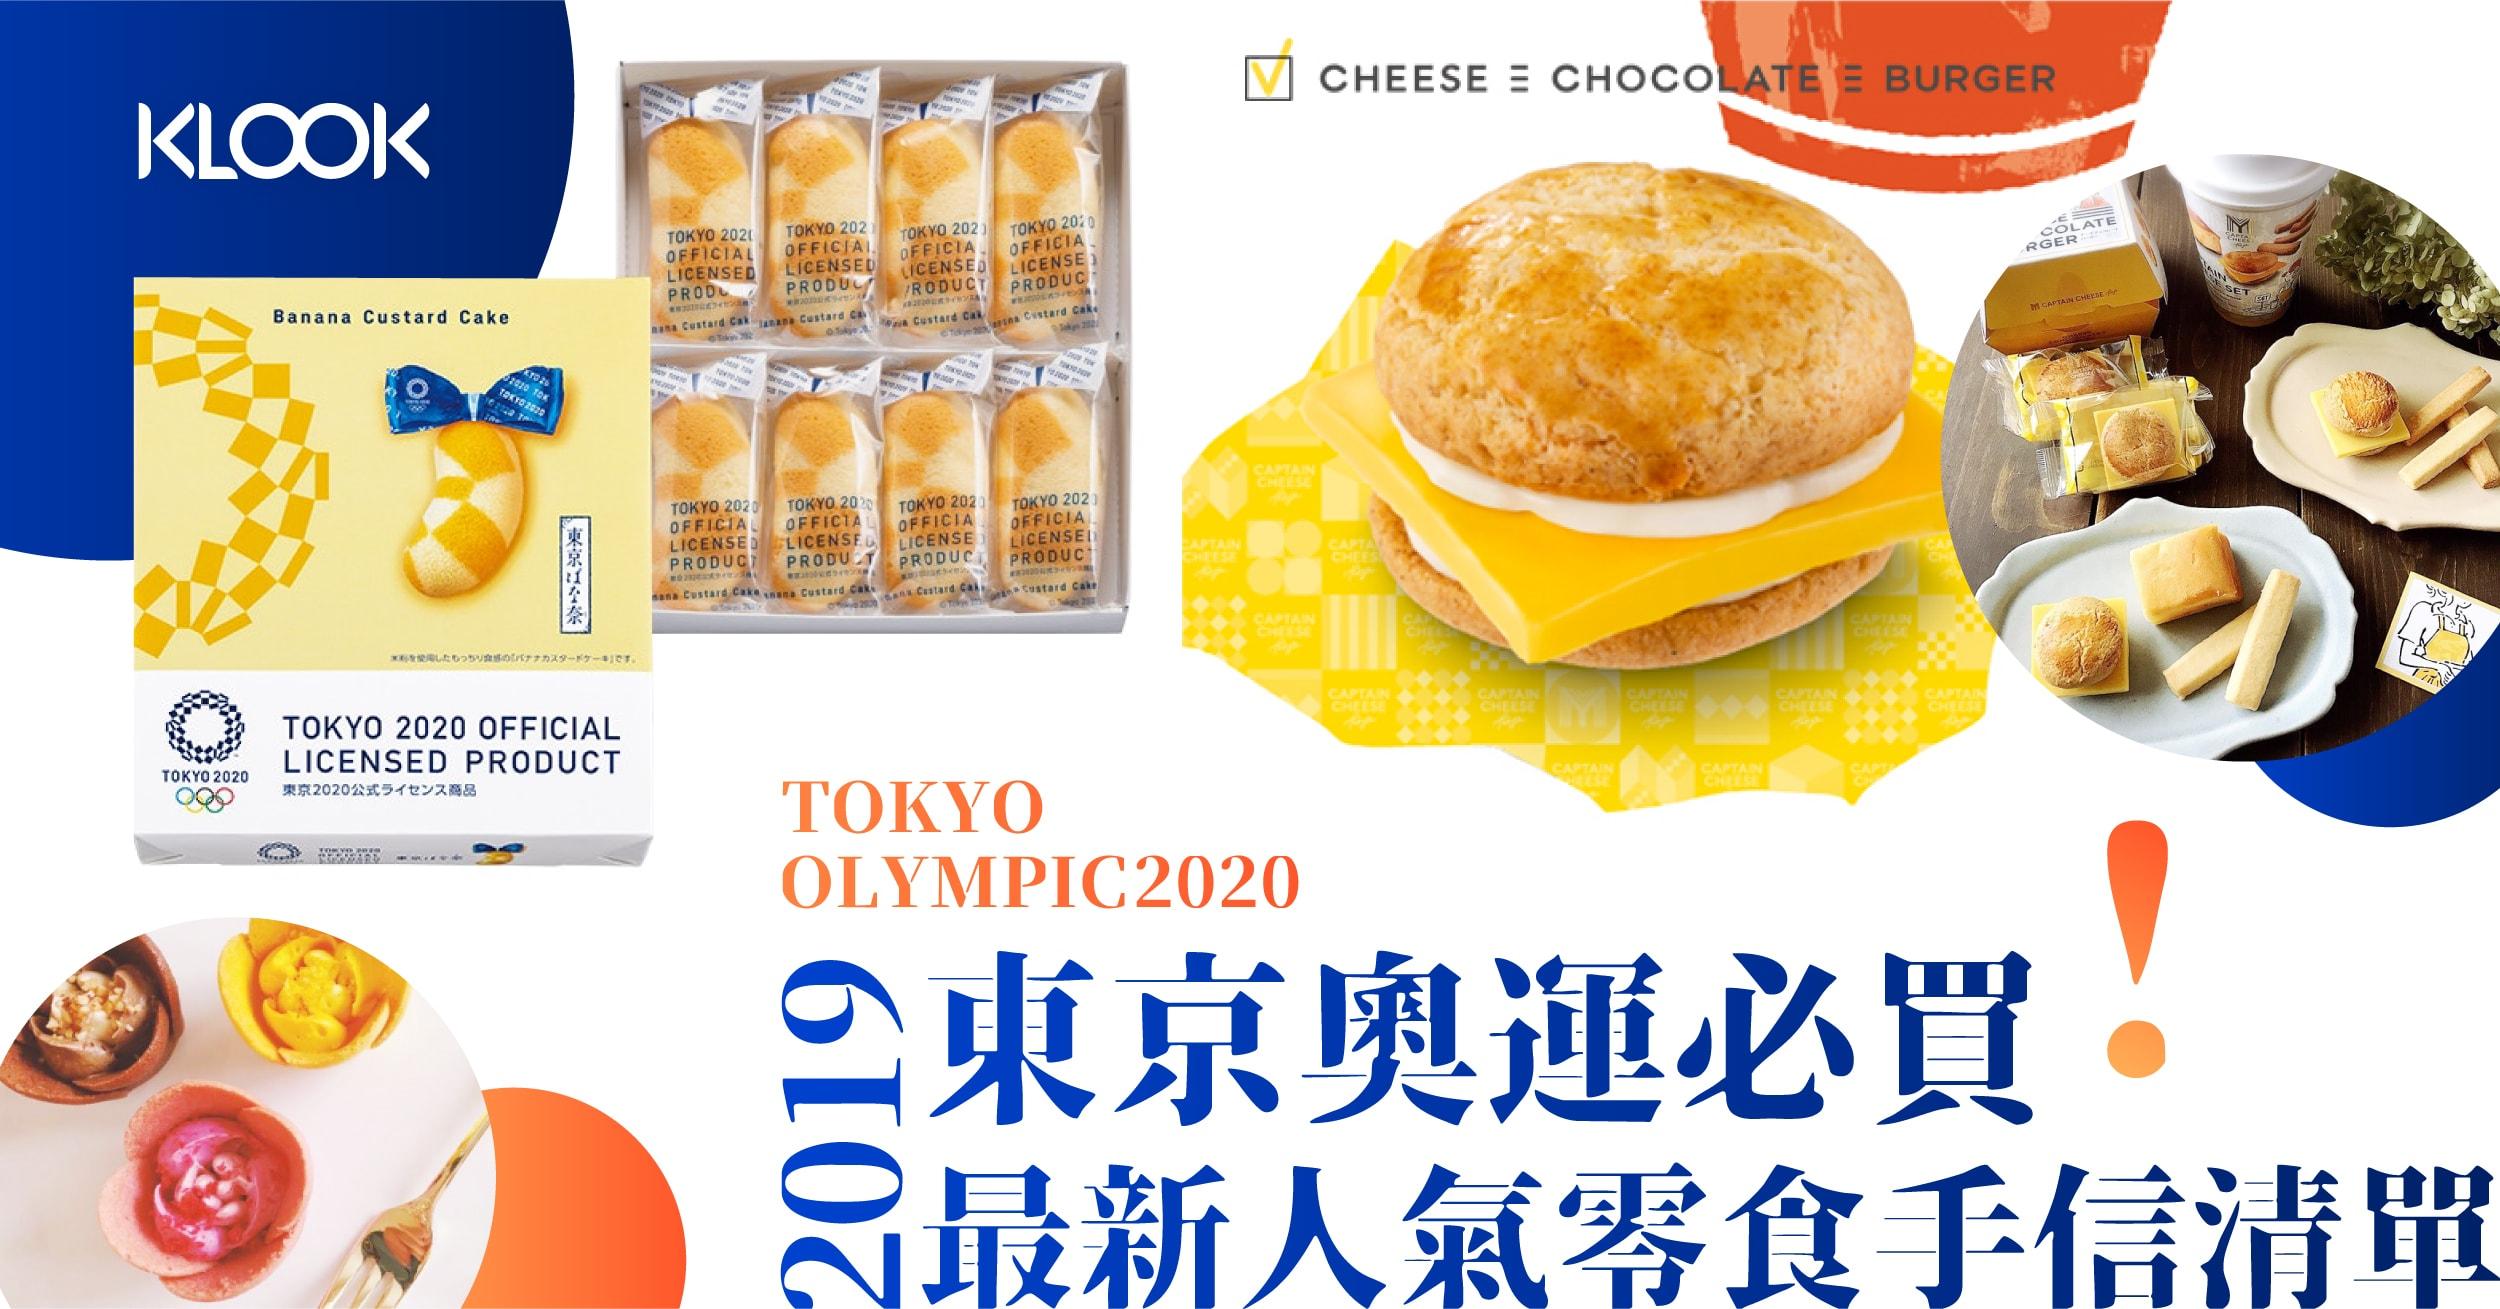 190820 Blog banner tokyo2020